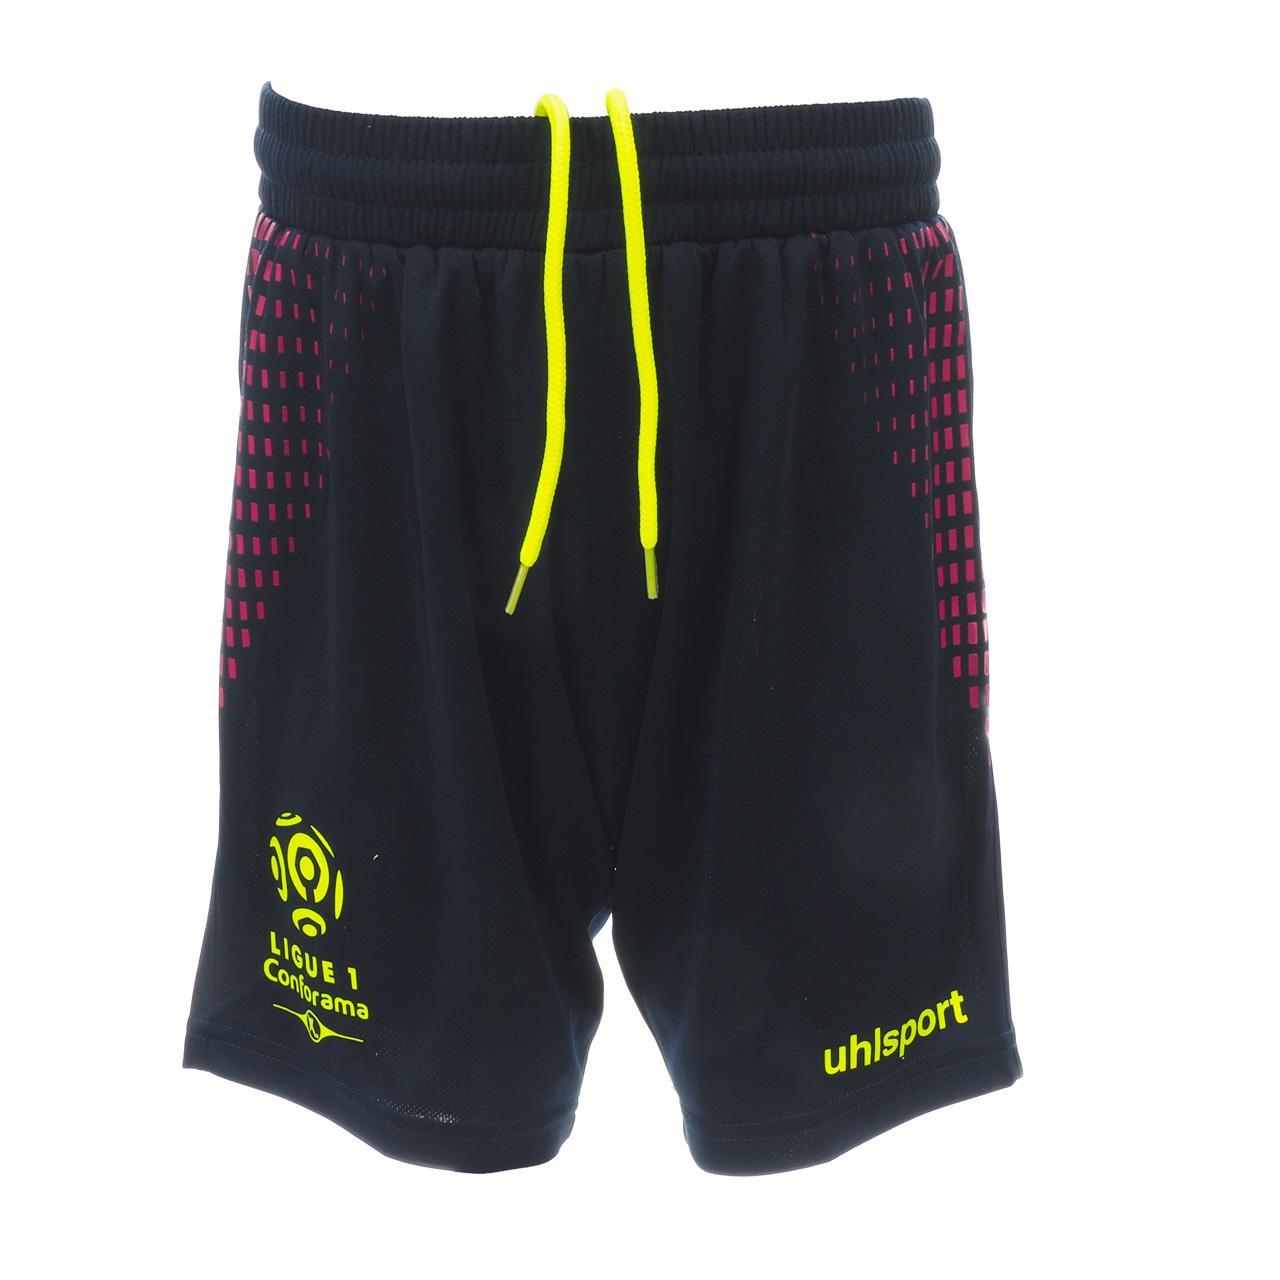 Set-Minikit-Football-Uhlsport-League-1-Jr-Jersey-Sh-Blue-49993-New thumbnail 4